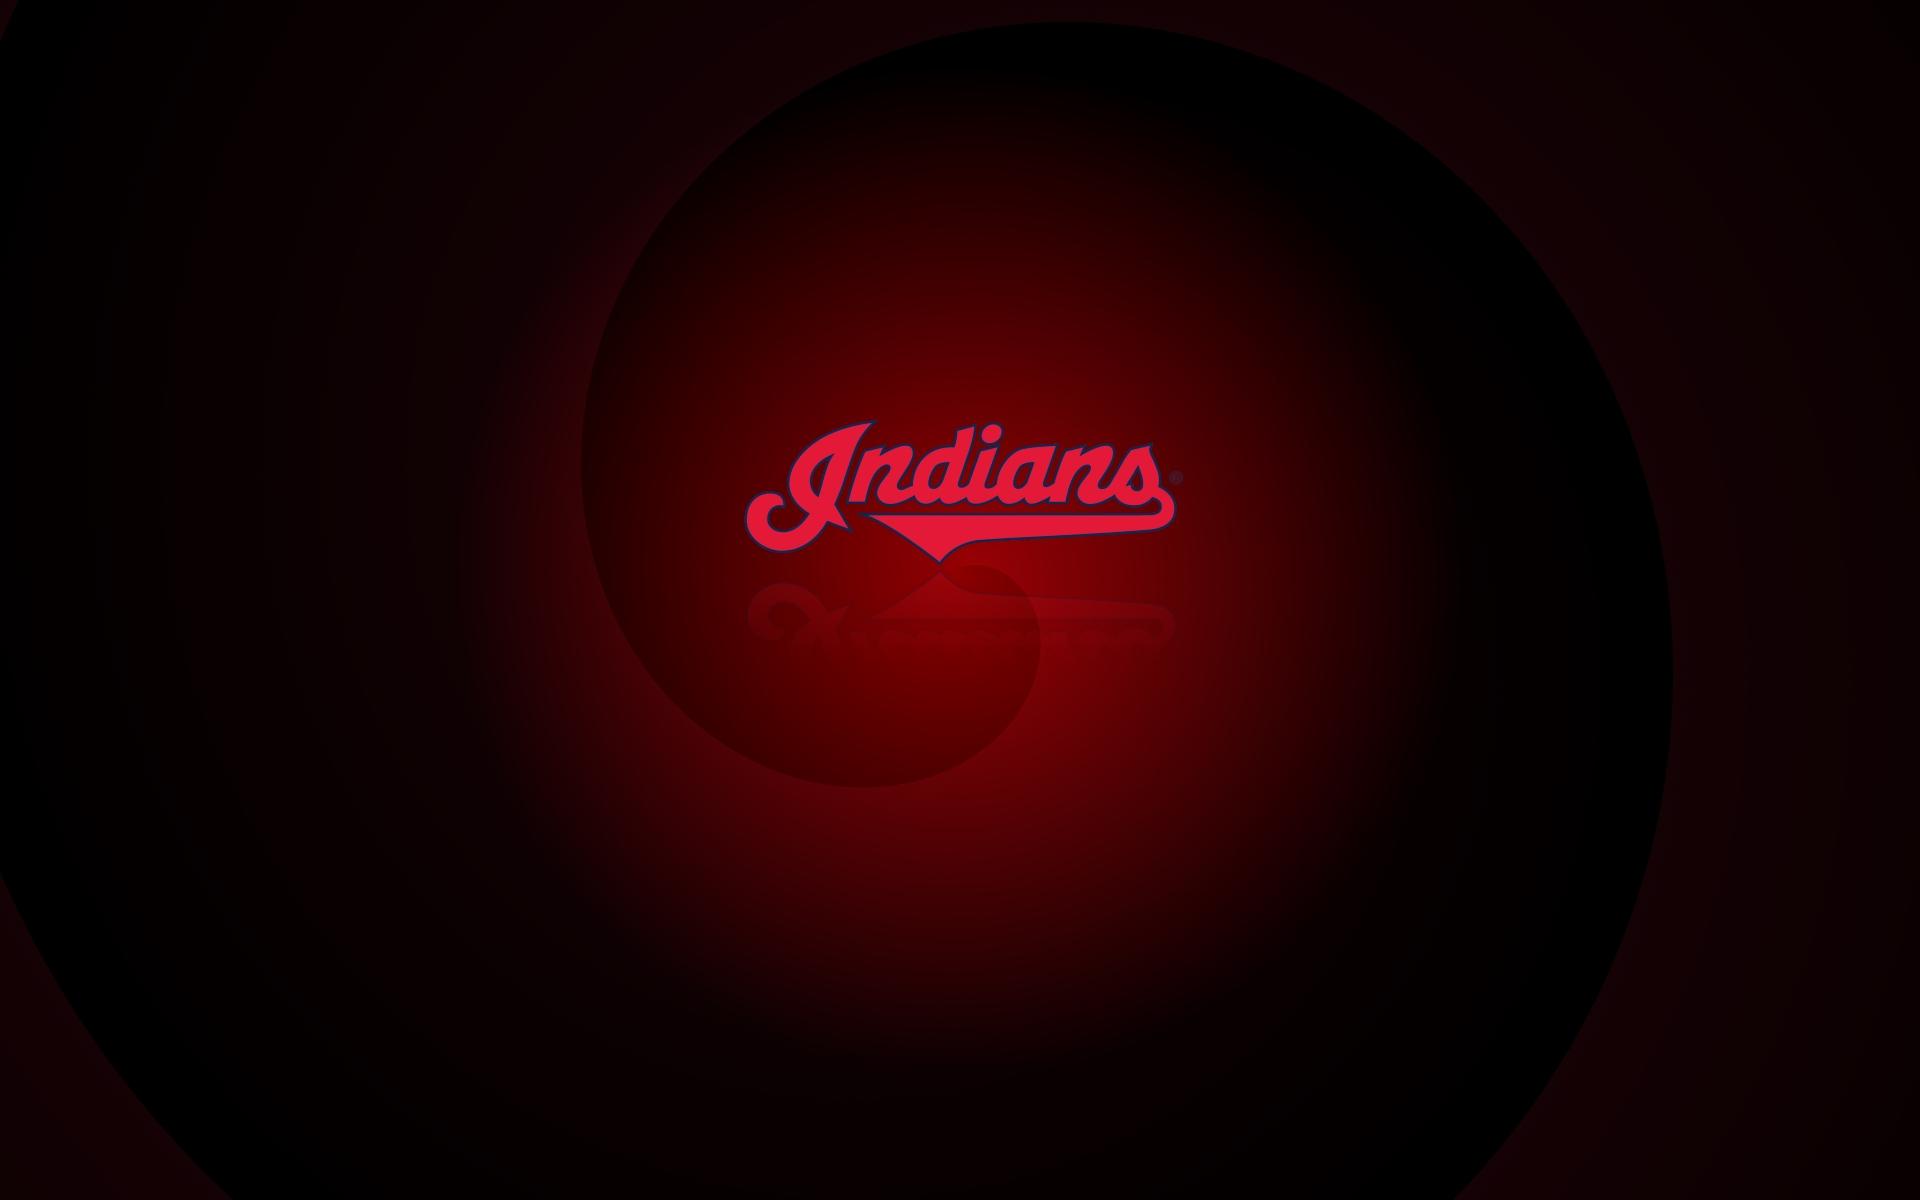 cleveland indians logos download